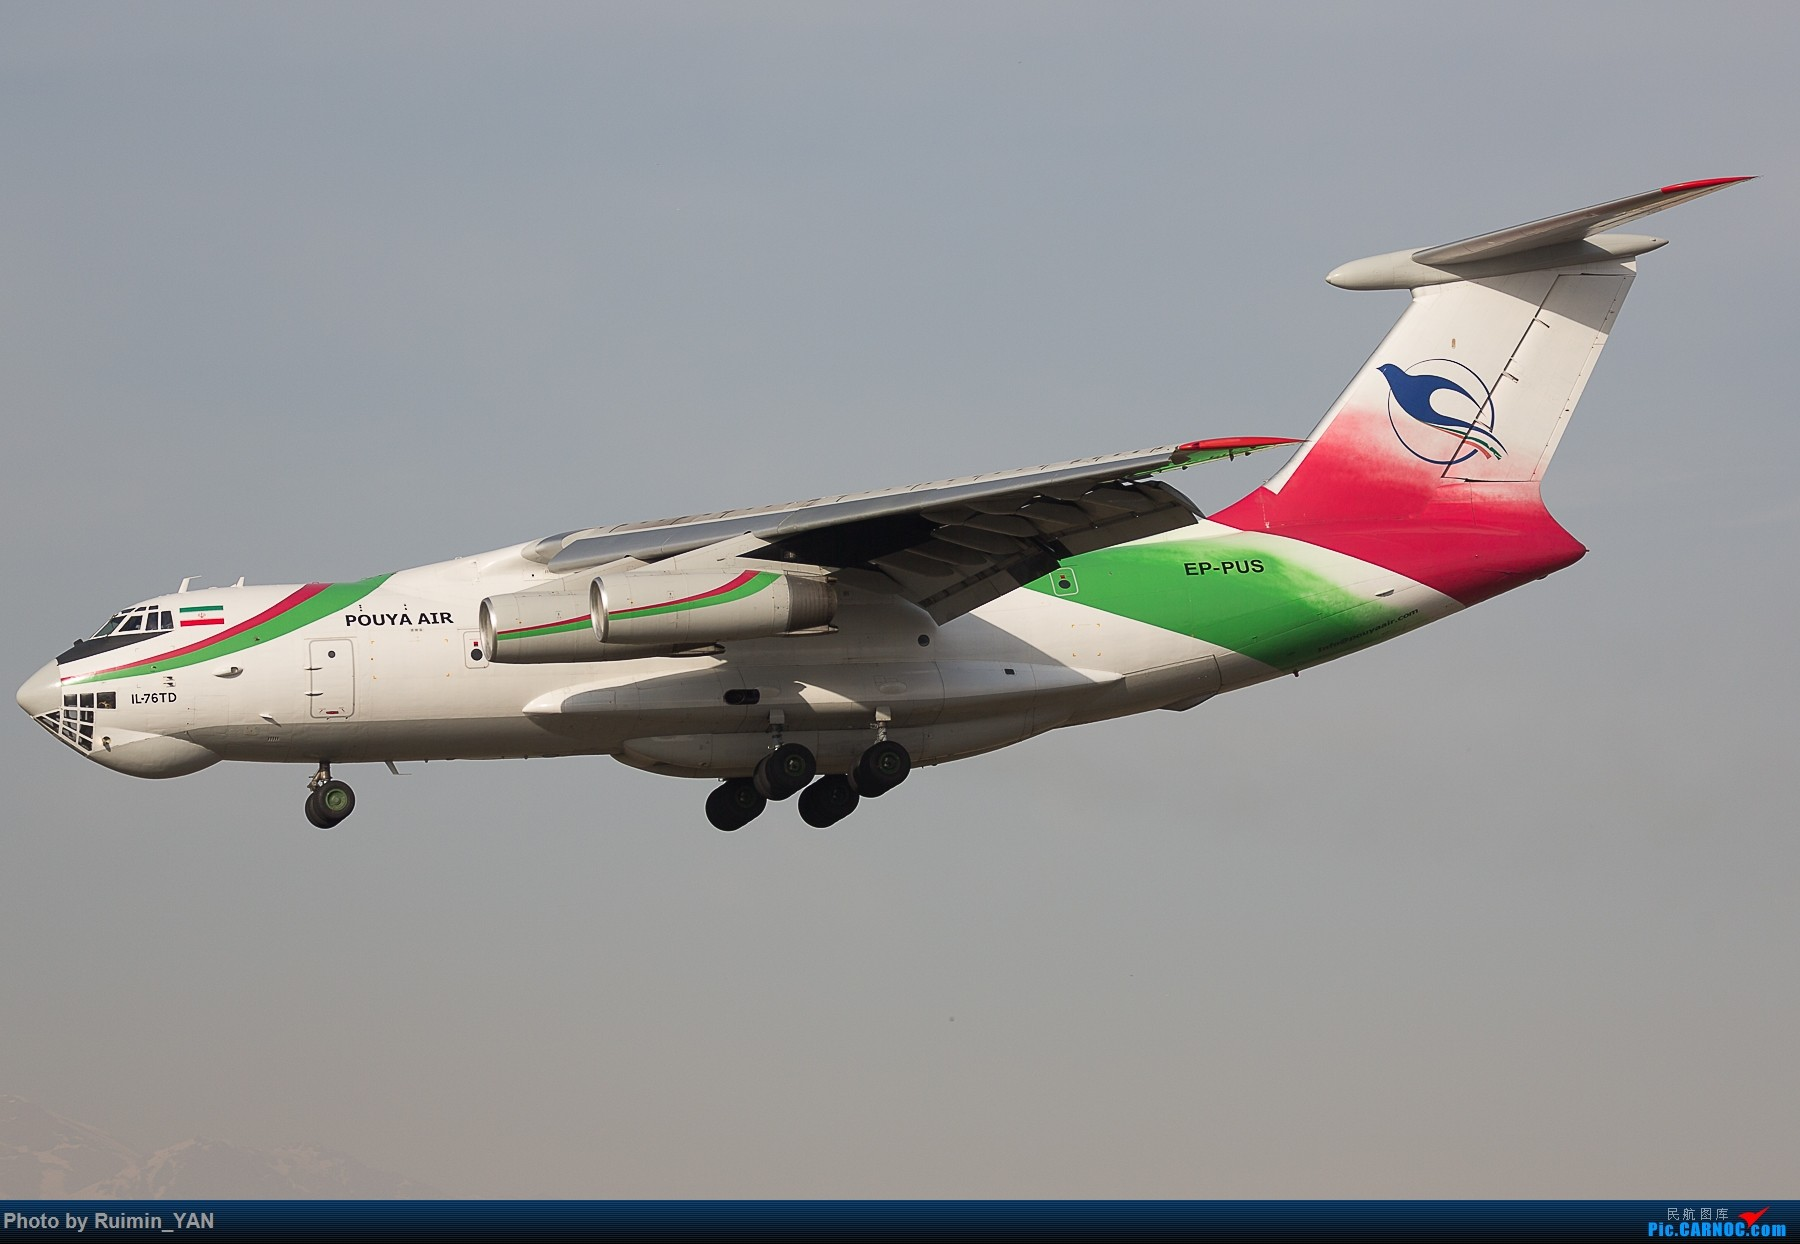 Re:[原创]【THR】(德黑兰梅赫拉巴德机场)伊朗Pouya航空(Pouya Air)--Ilyushin IL-76-TD ILYUSHIN IL-76-TD EP-PUS 德黑兰梅赫拉巴德国际机场